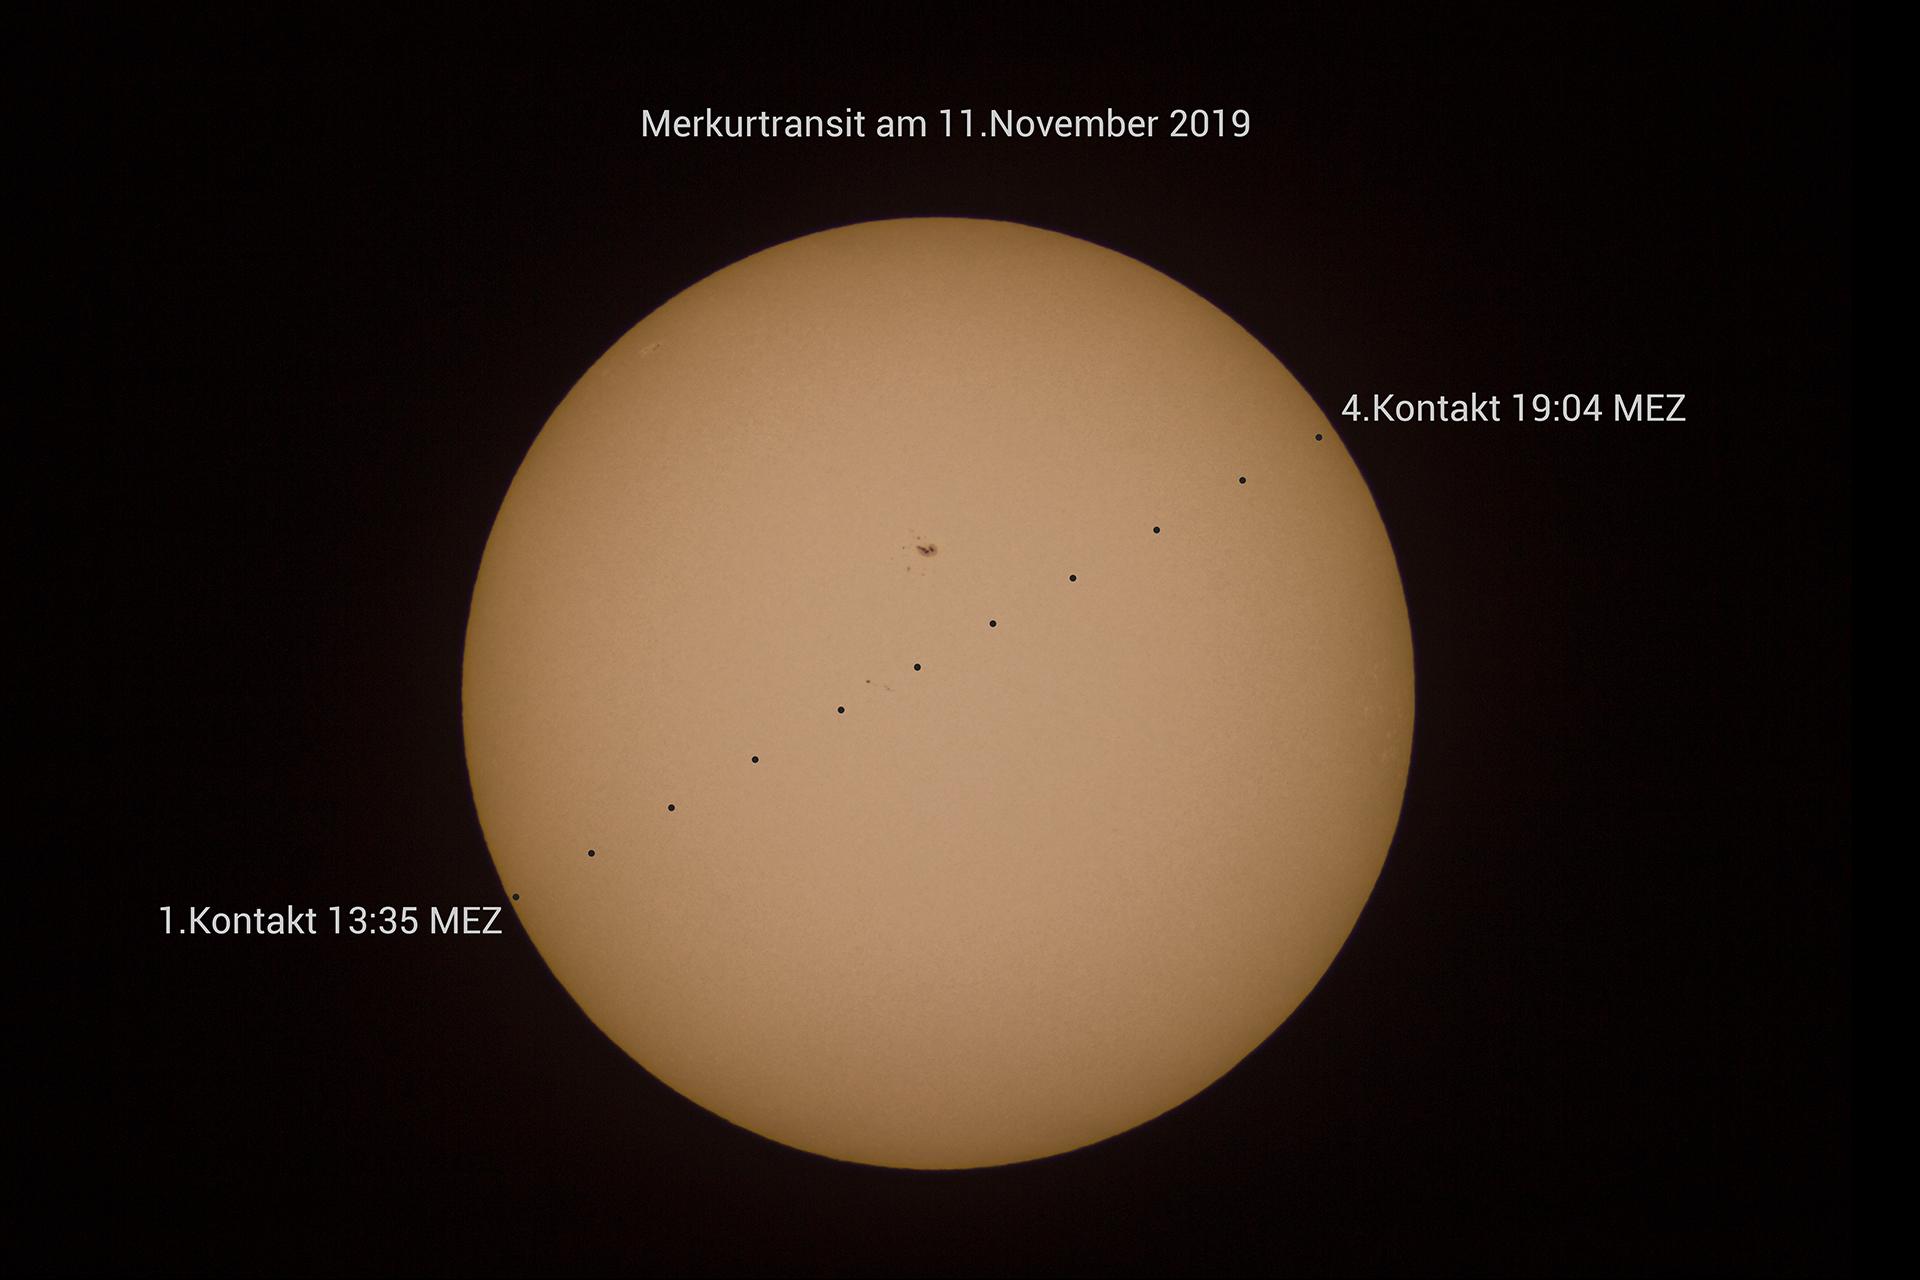 Merkurtransit 2019